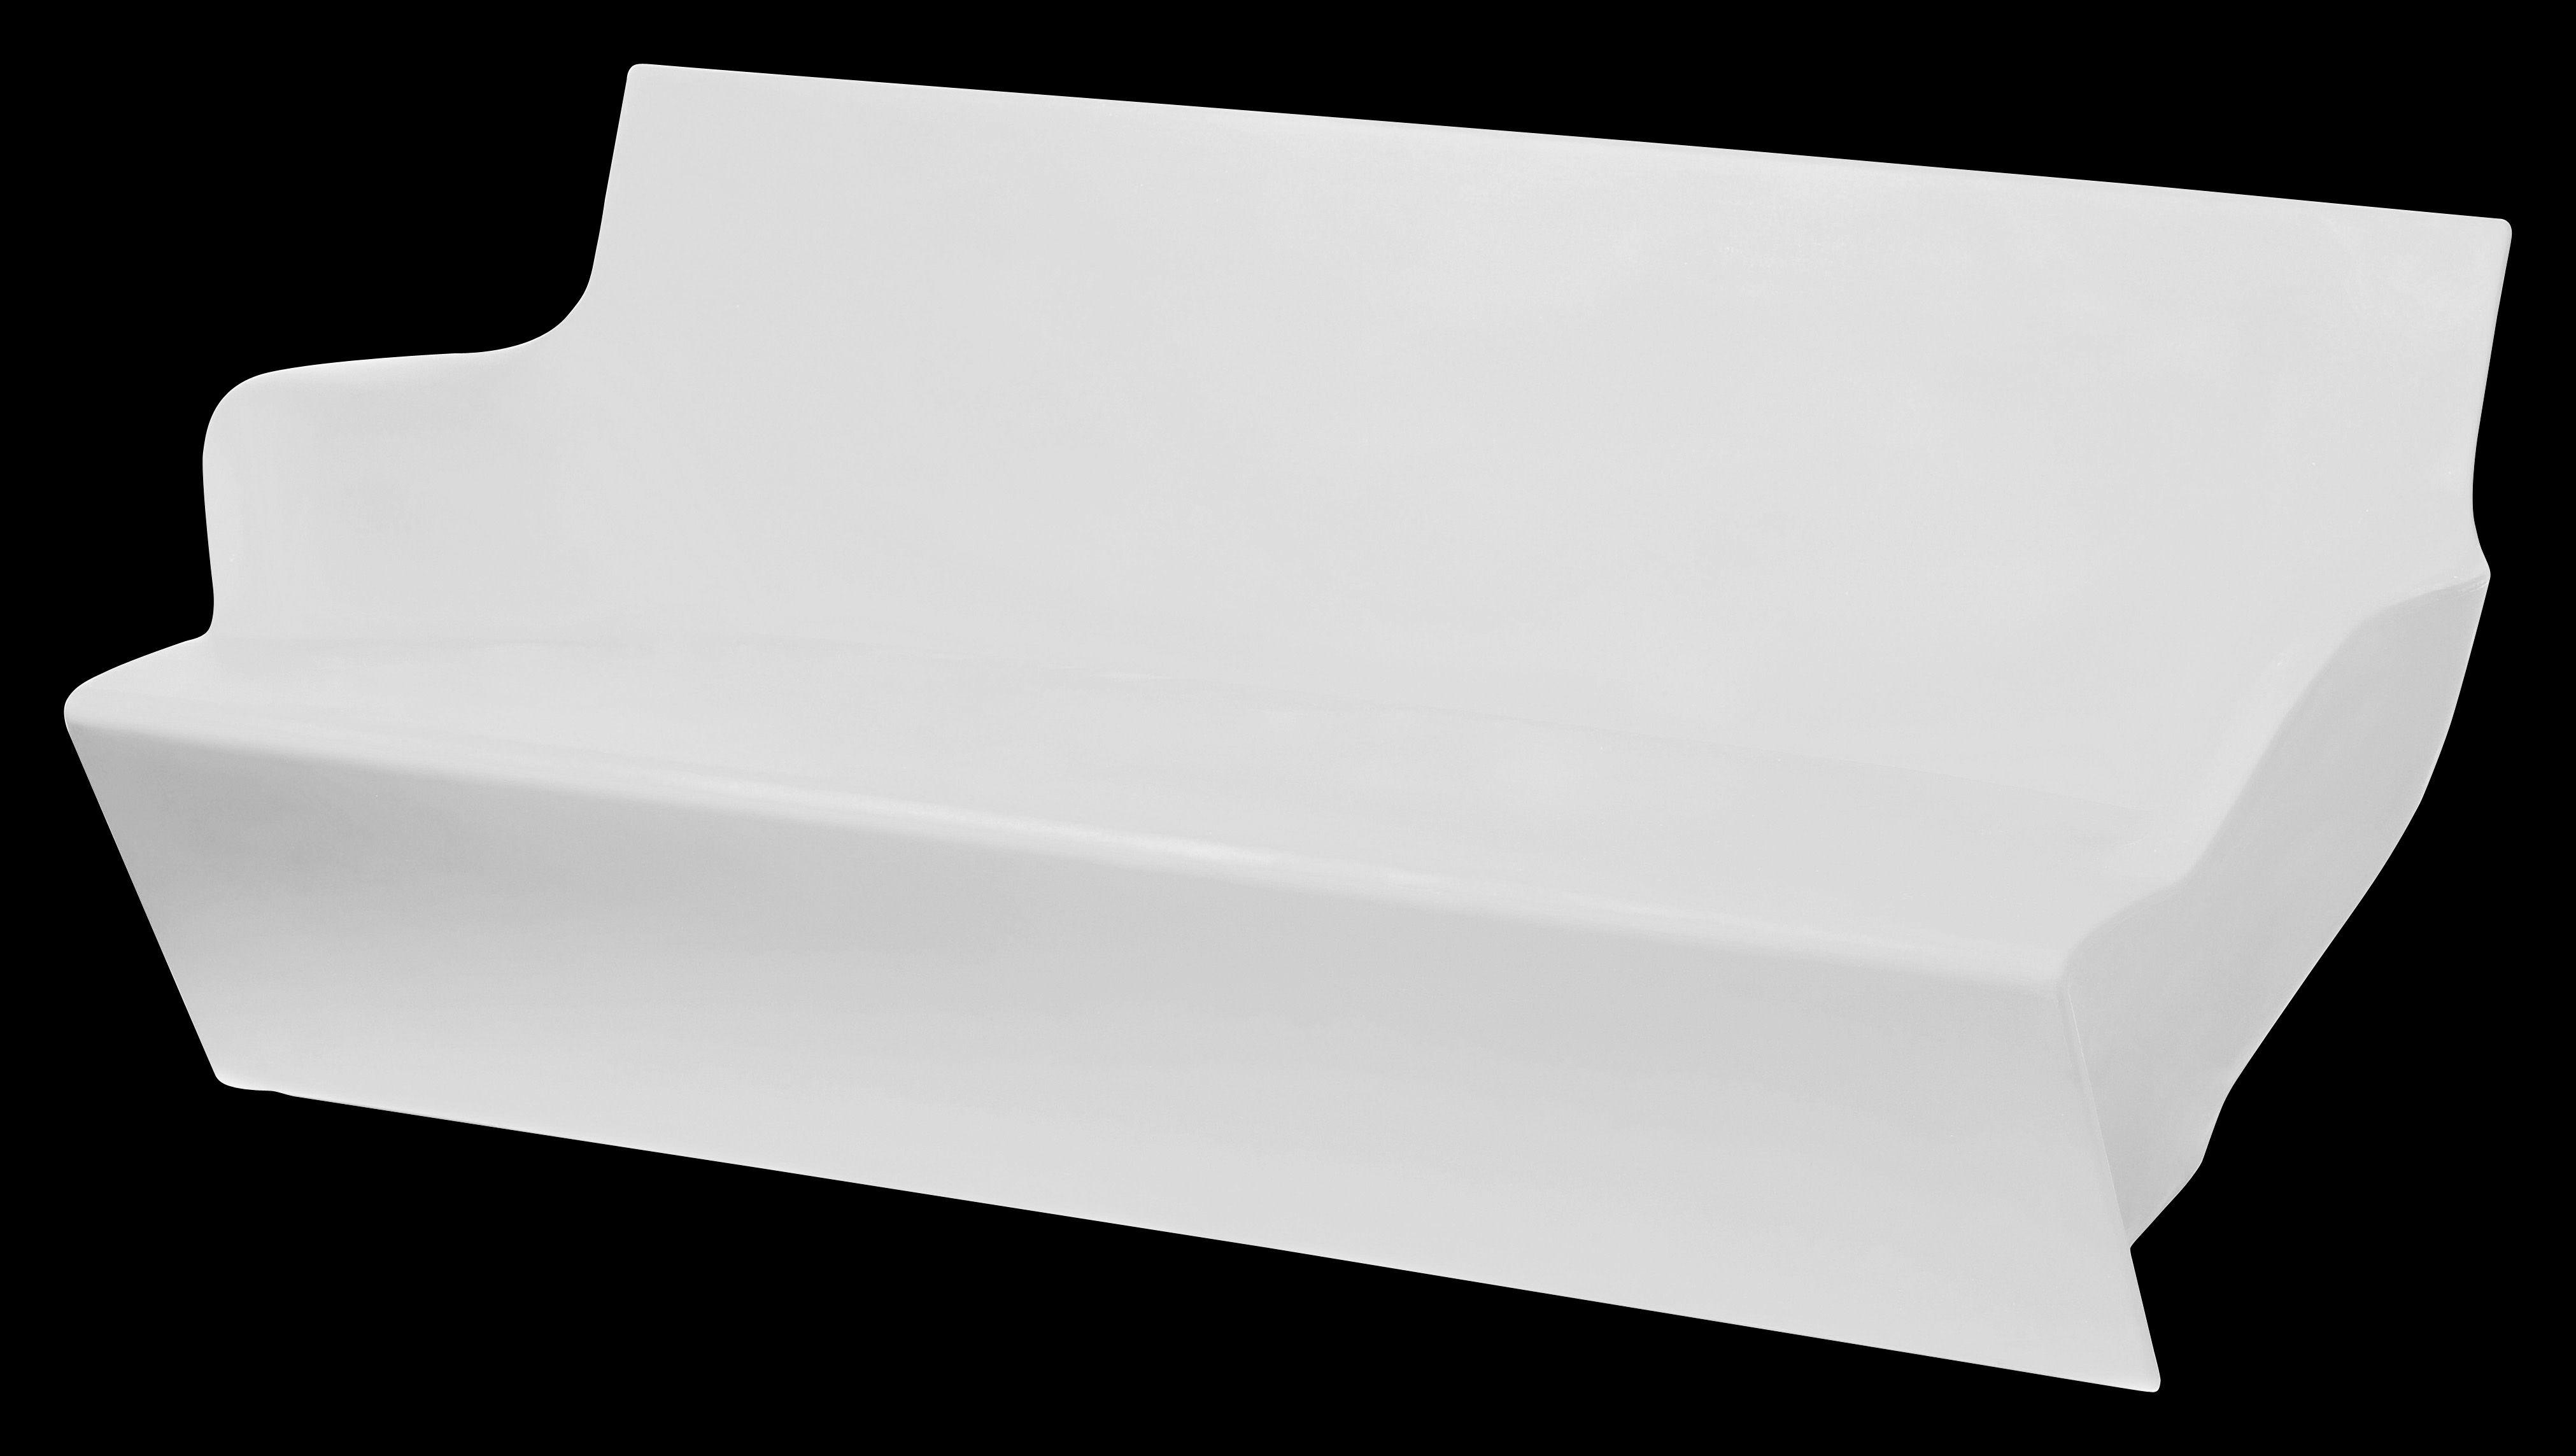 Möbel - Leuchtmöbel - Kami Yon beleuchtetes Sofa - Slide - Weiß, mit integrierter Lampe - Polyäthylen